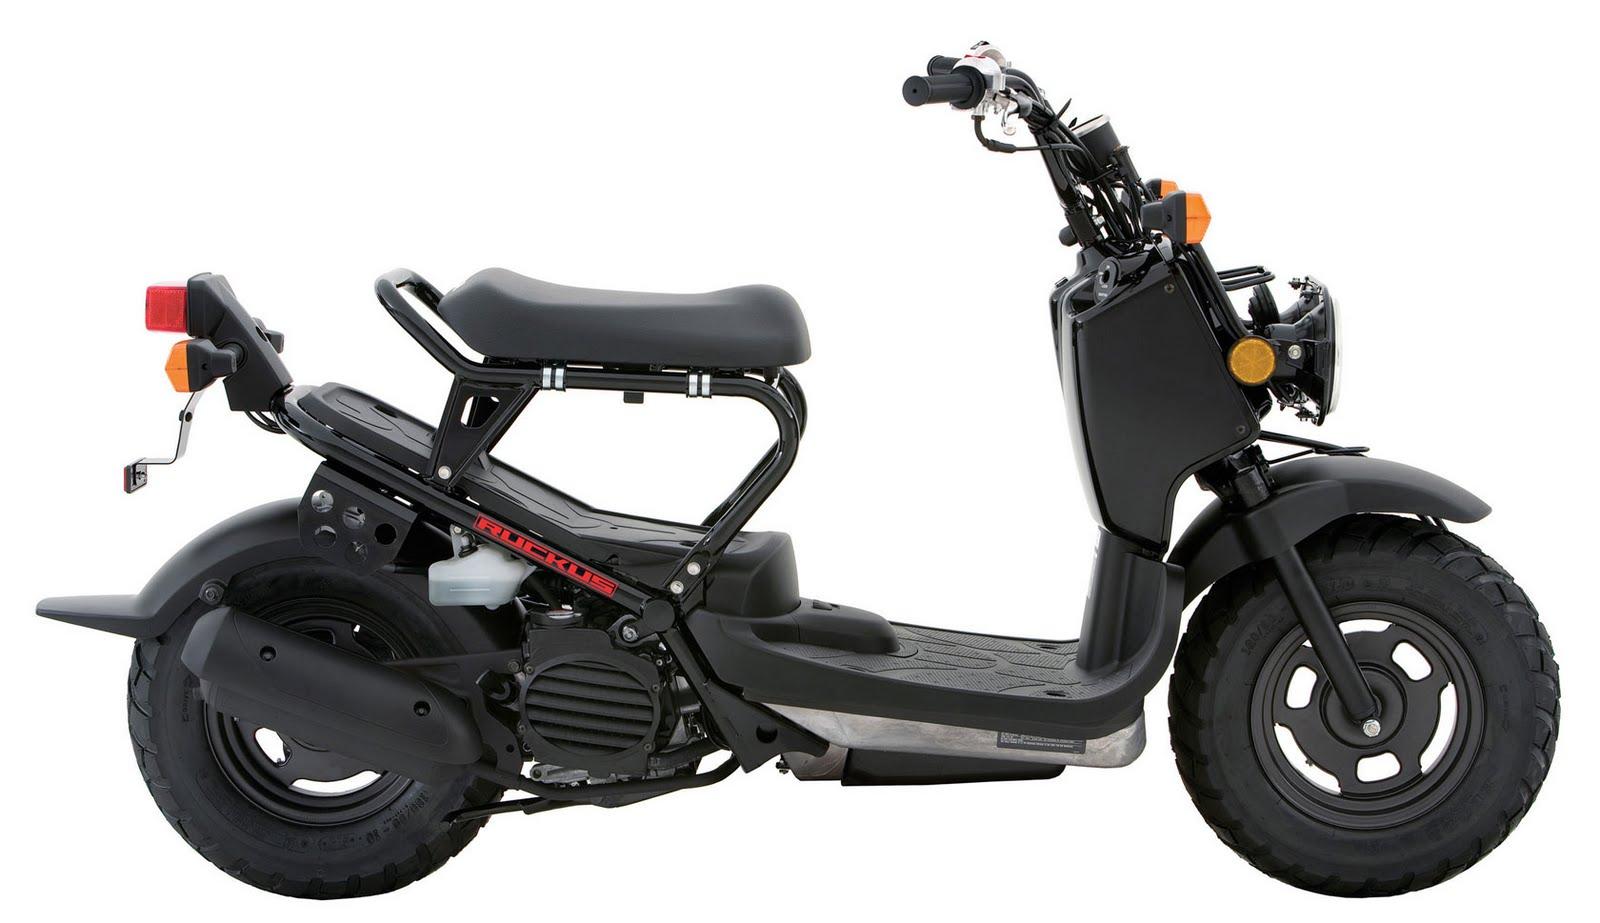 2011 New Scooters Honda Ruckus NPS50  GAMBAR FOTO CONTEST